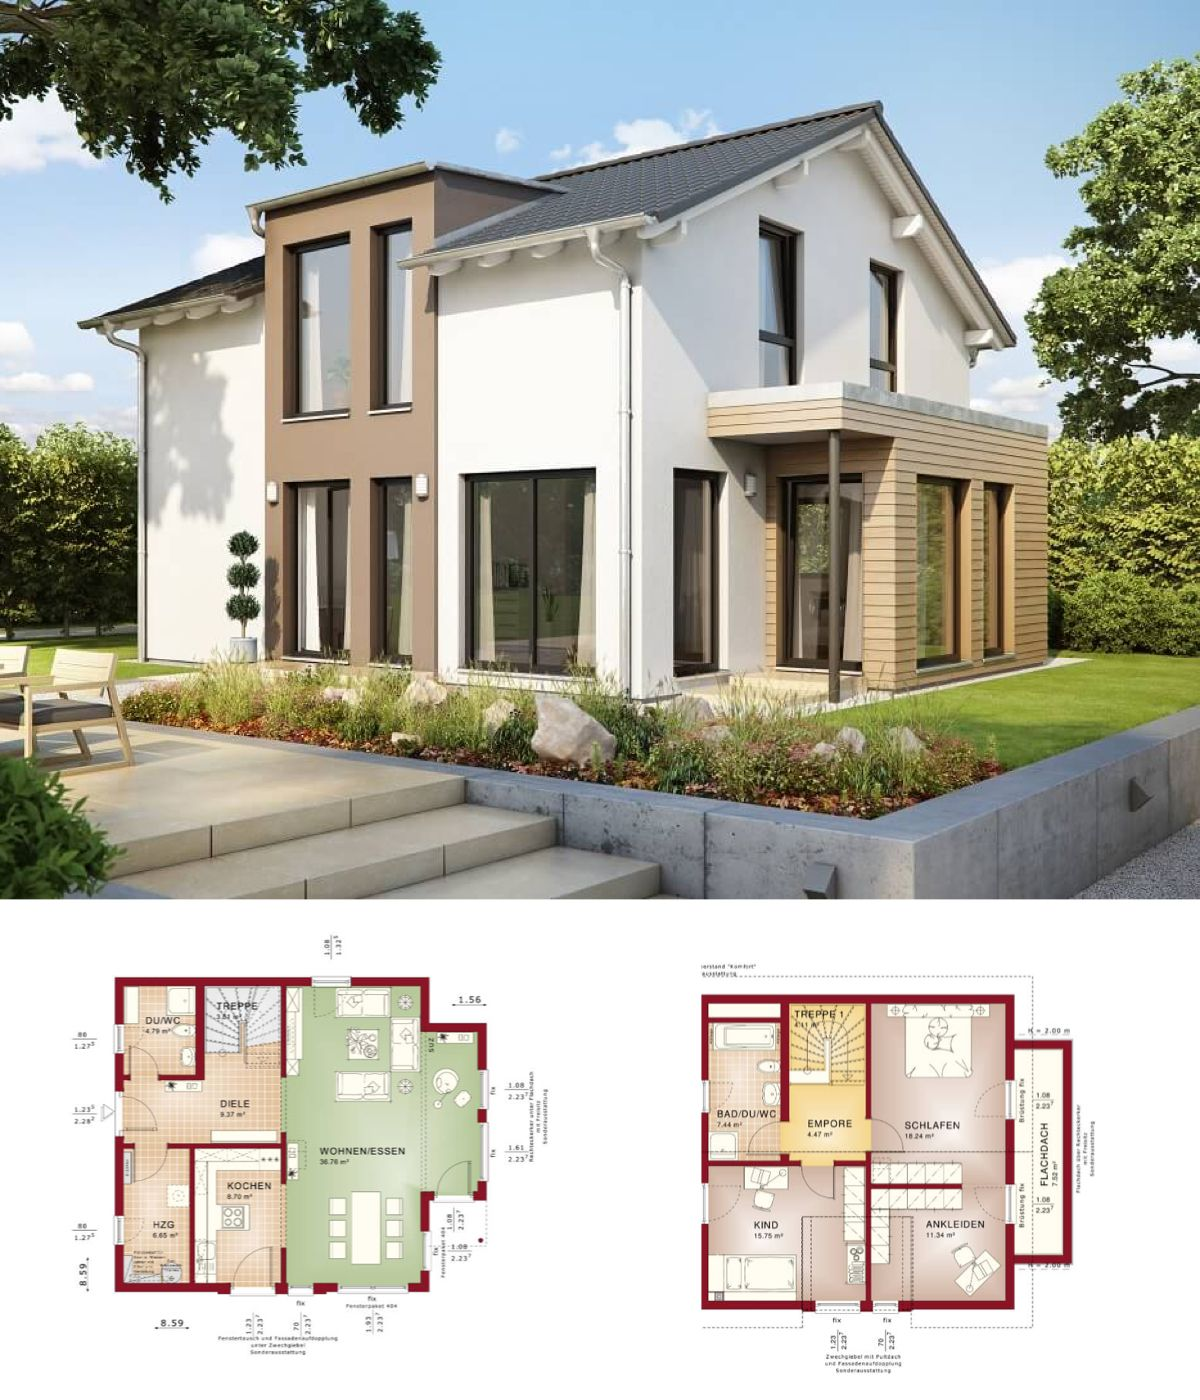 EINFAMILIENHAUS modern Haus Solution 125 v7 Living Haus